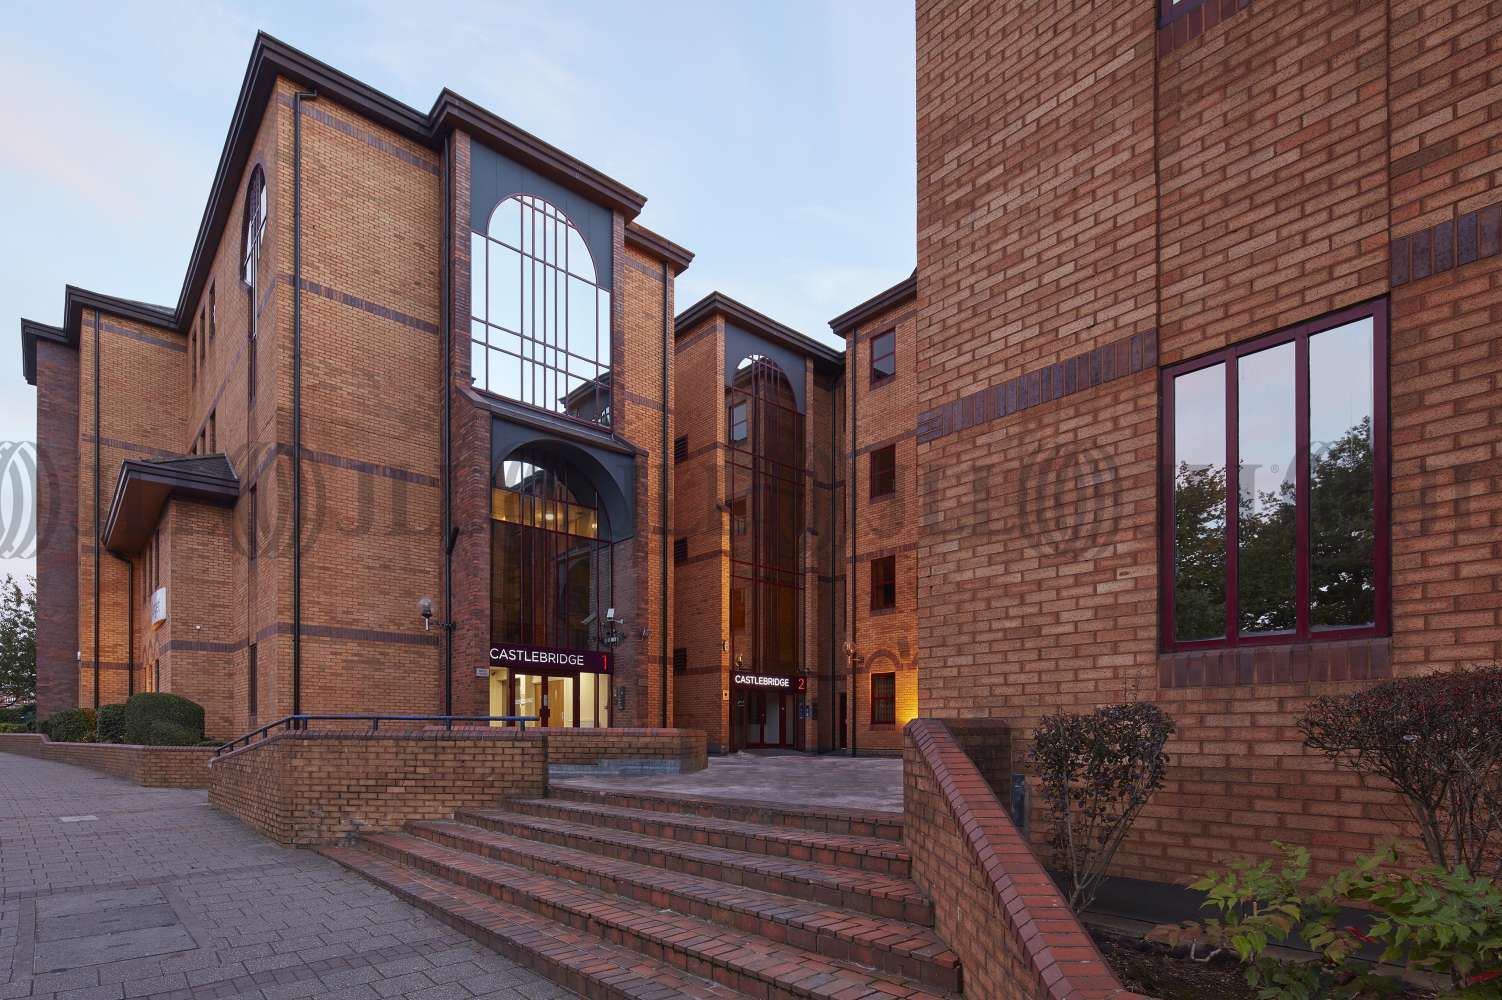 Office Cardiff, CF11 9AB - Ground floor, 2 Castlebridge - 56083